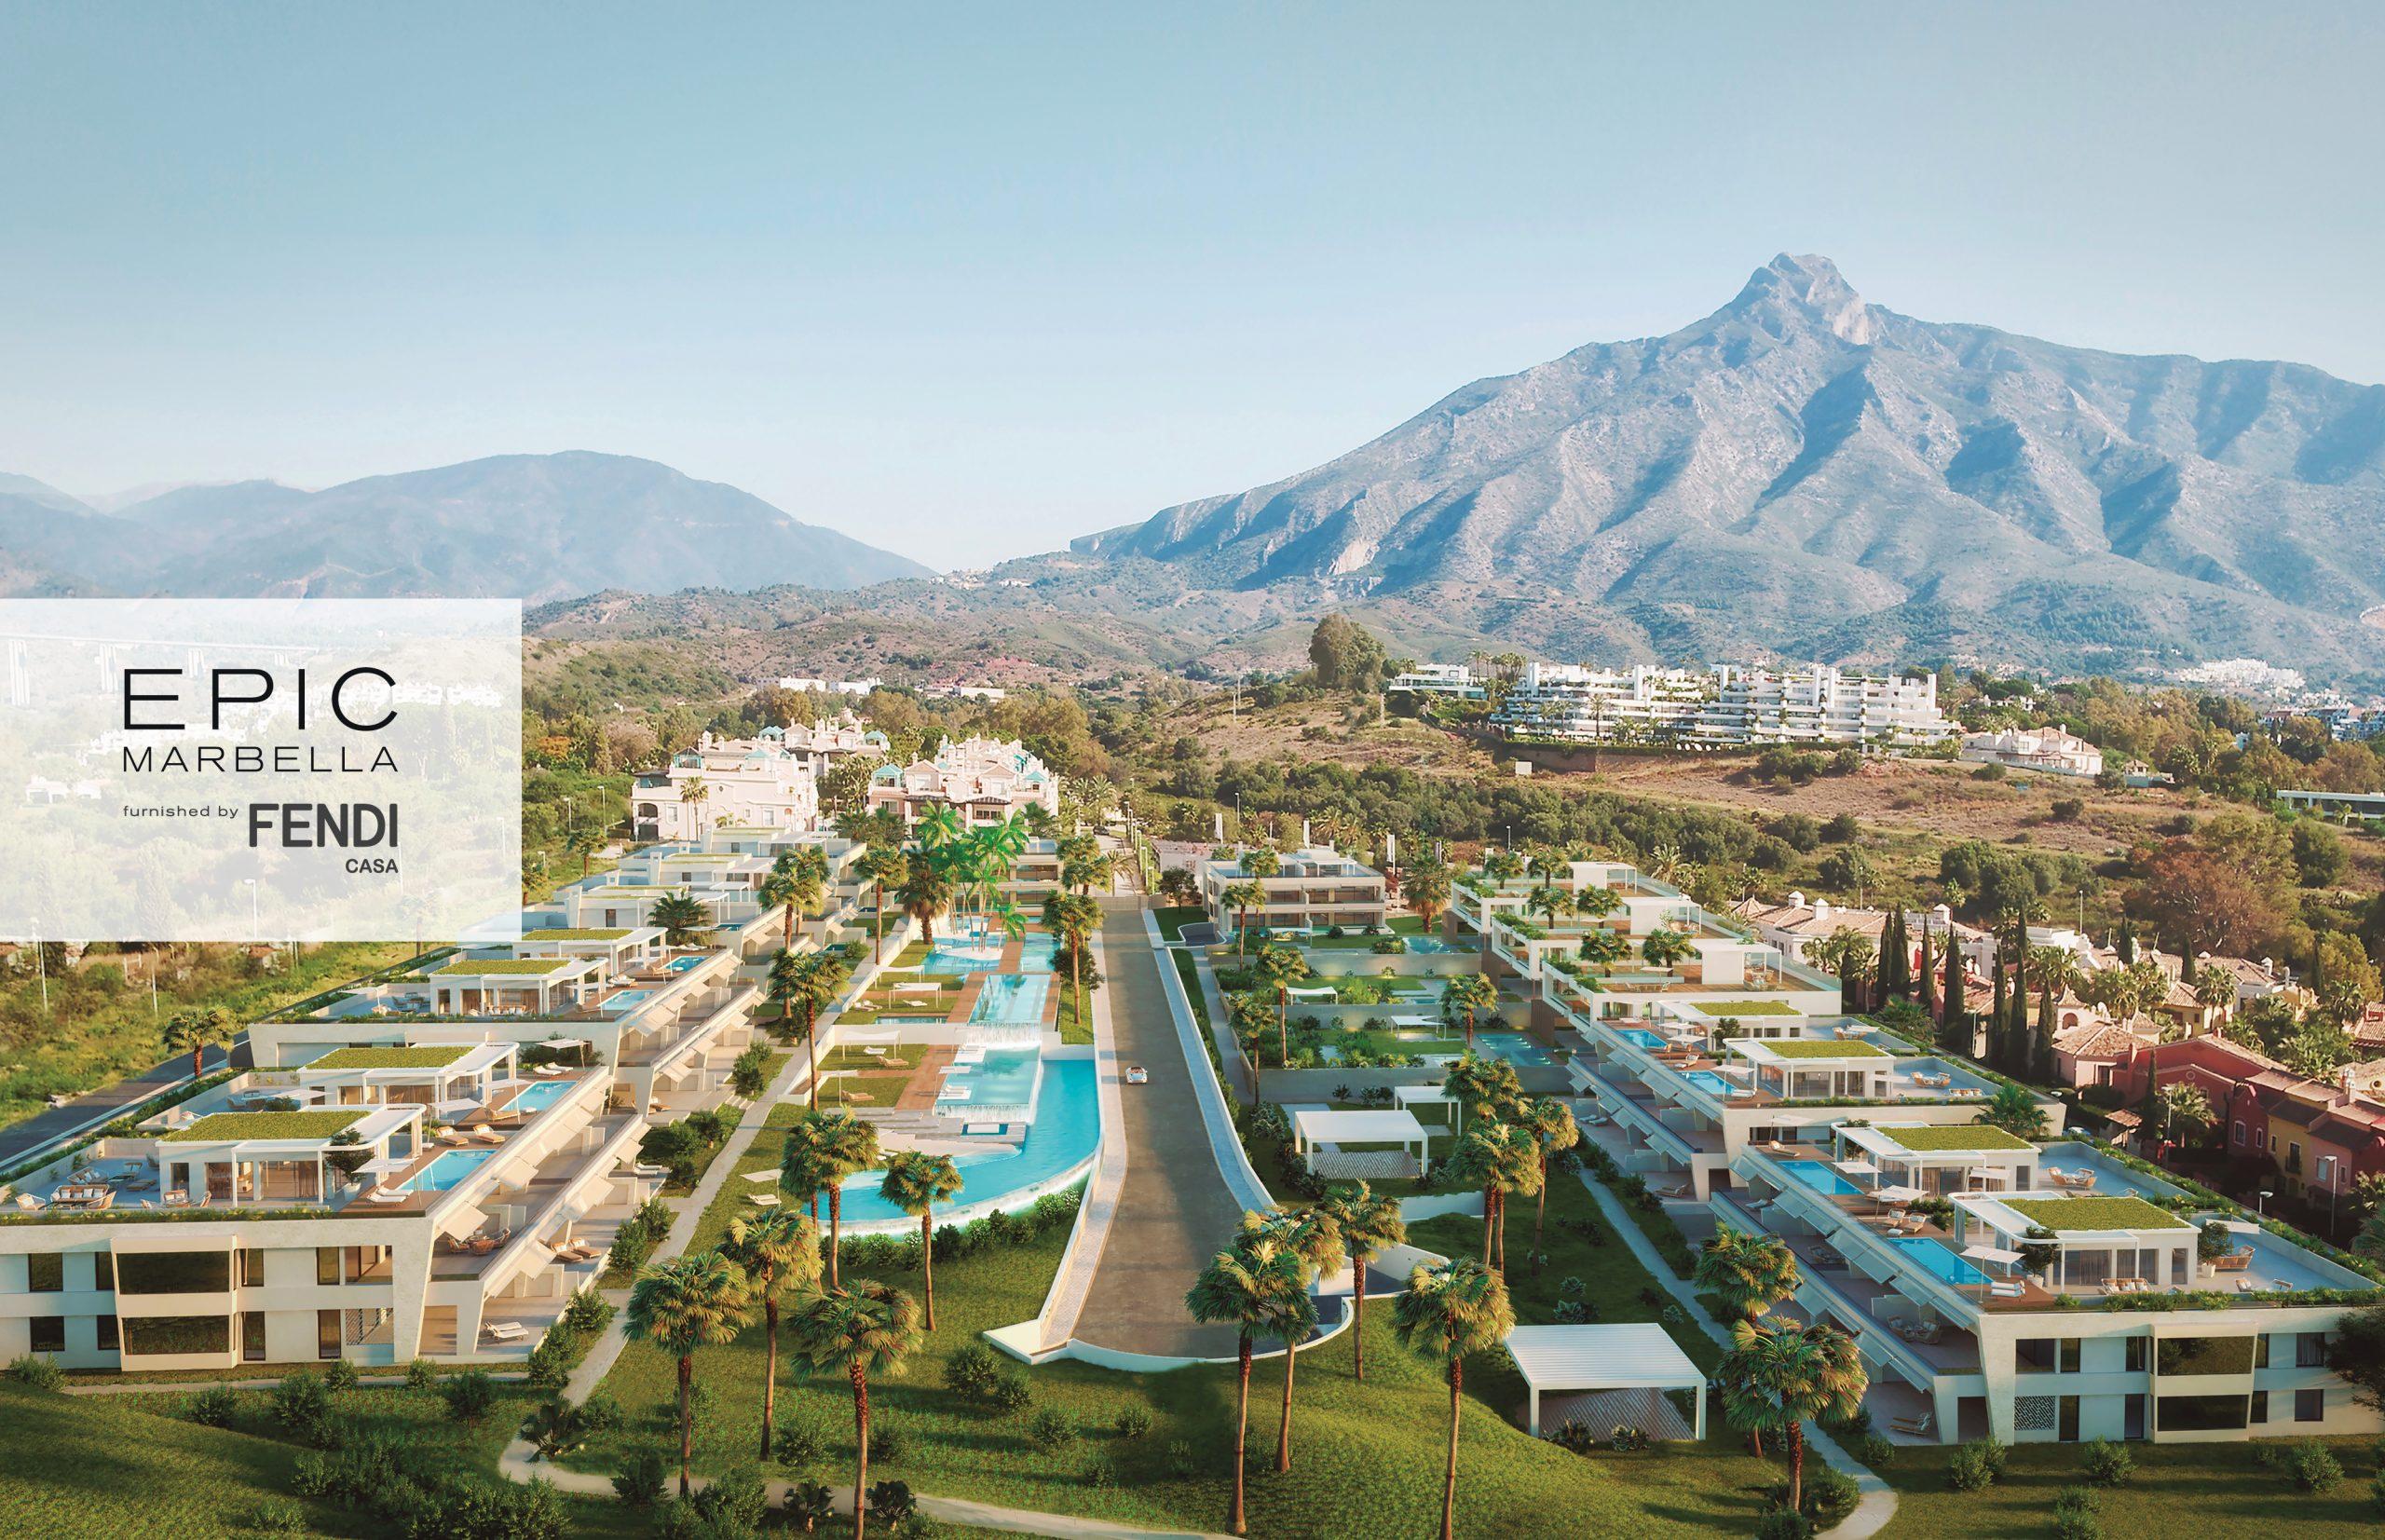 EPIC Marbella masterplan